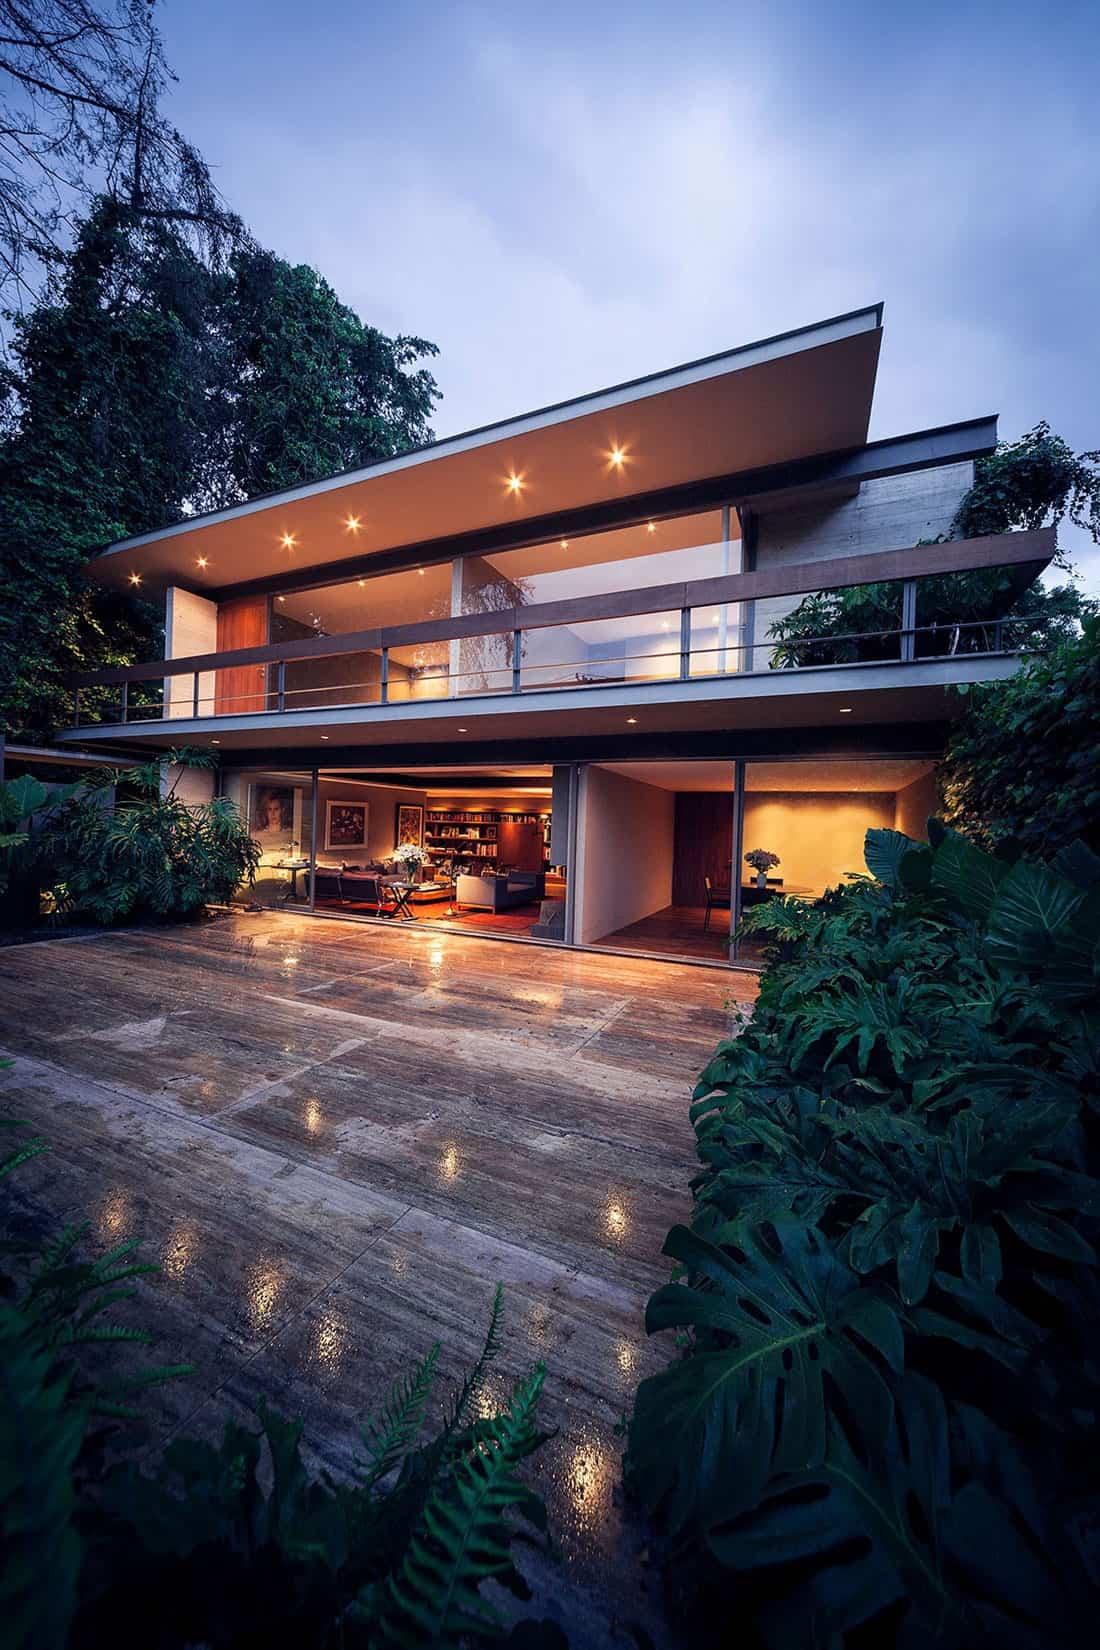 Sierra Fria by JJRR Arquitectura (28)